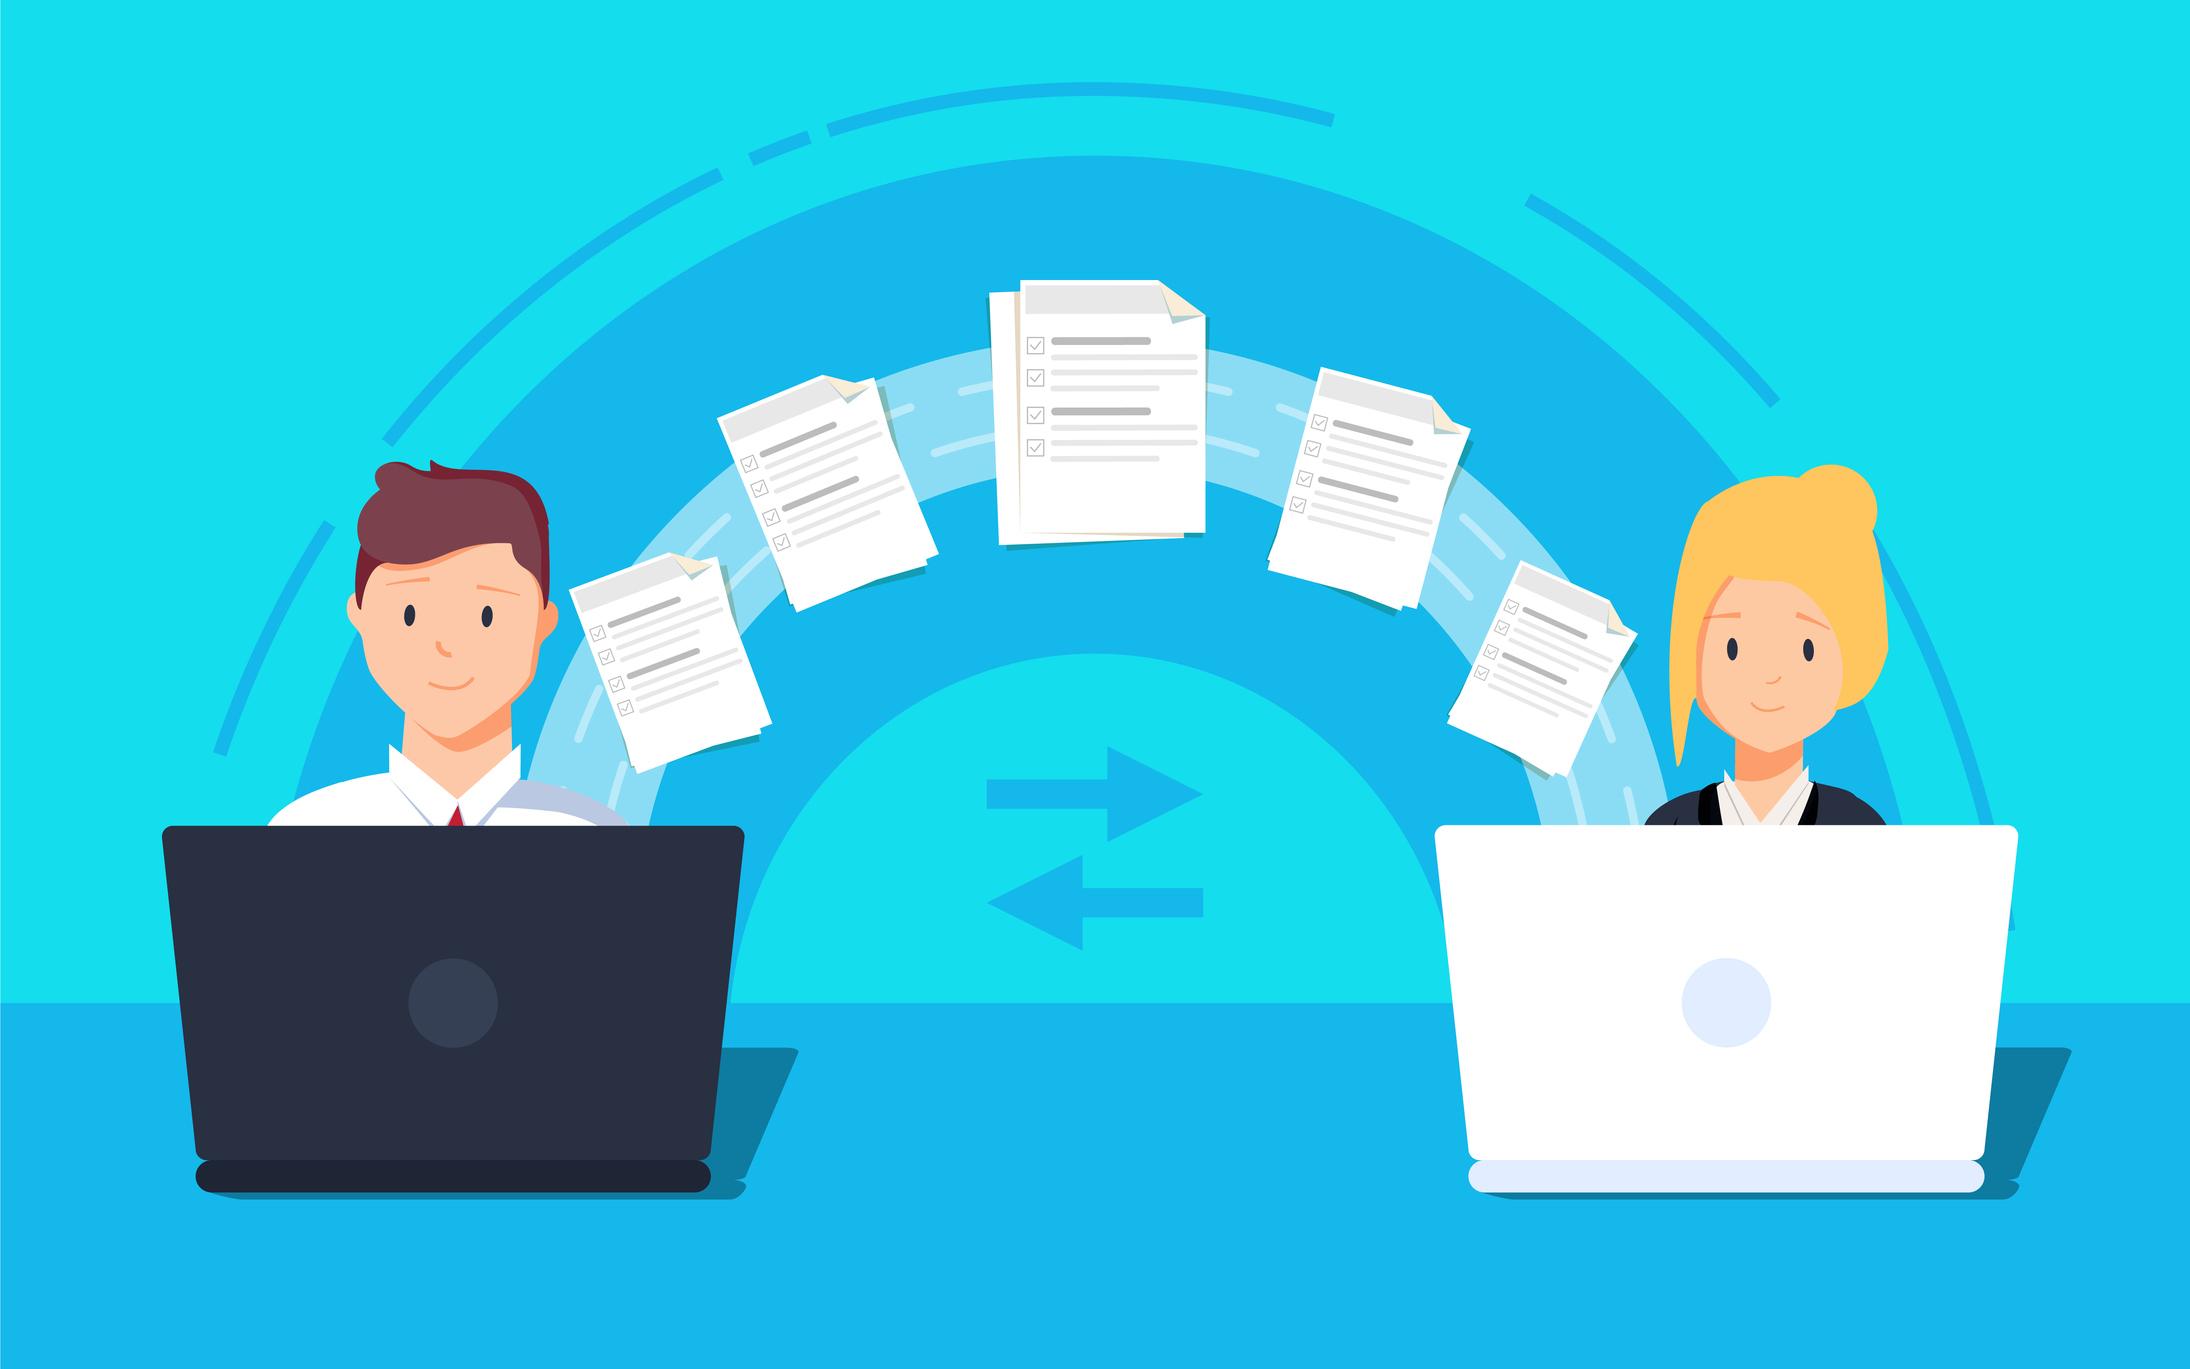 10 Mio Dokumente in der AMAGNO Business Cloud